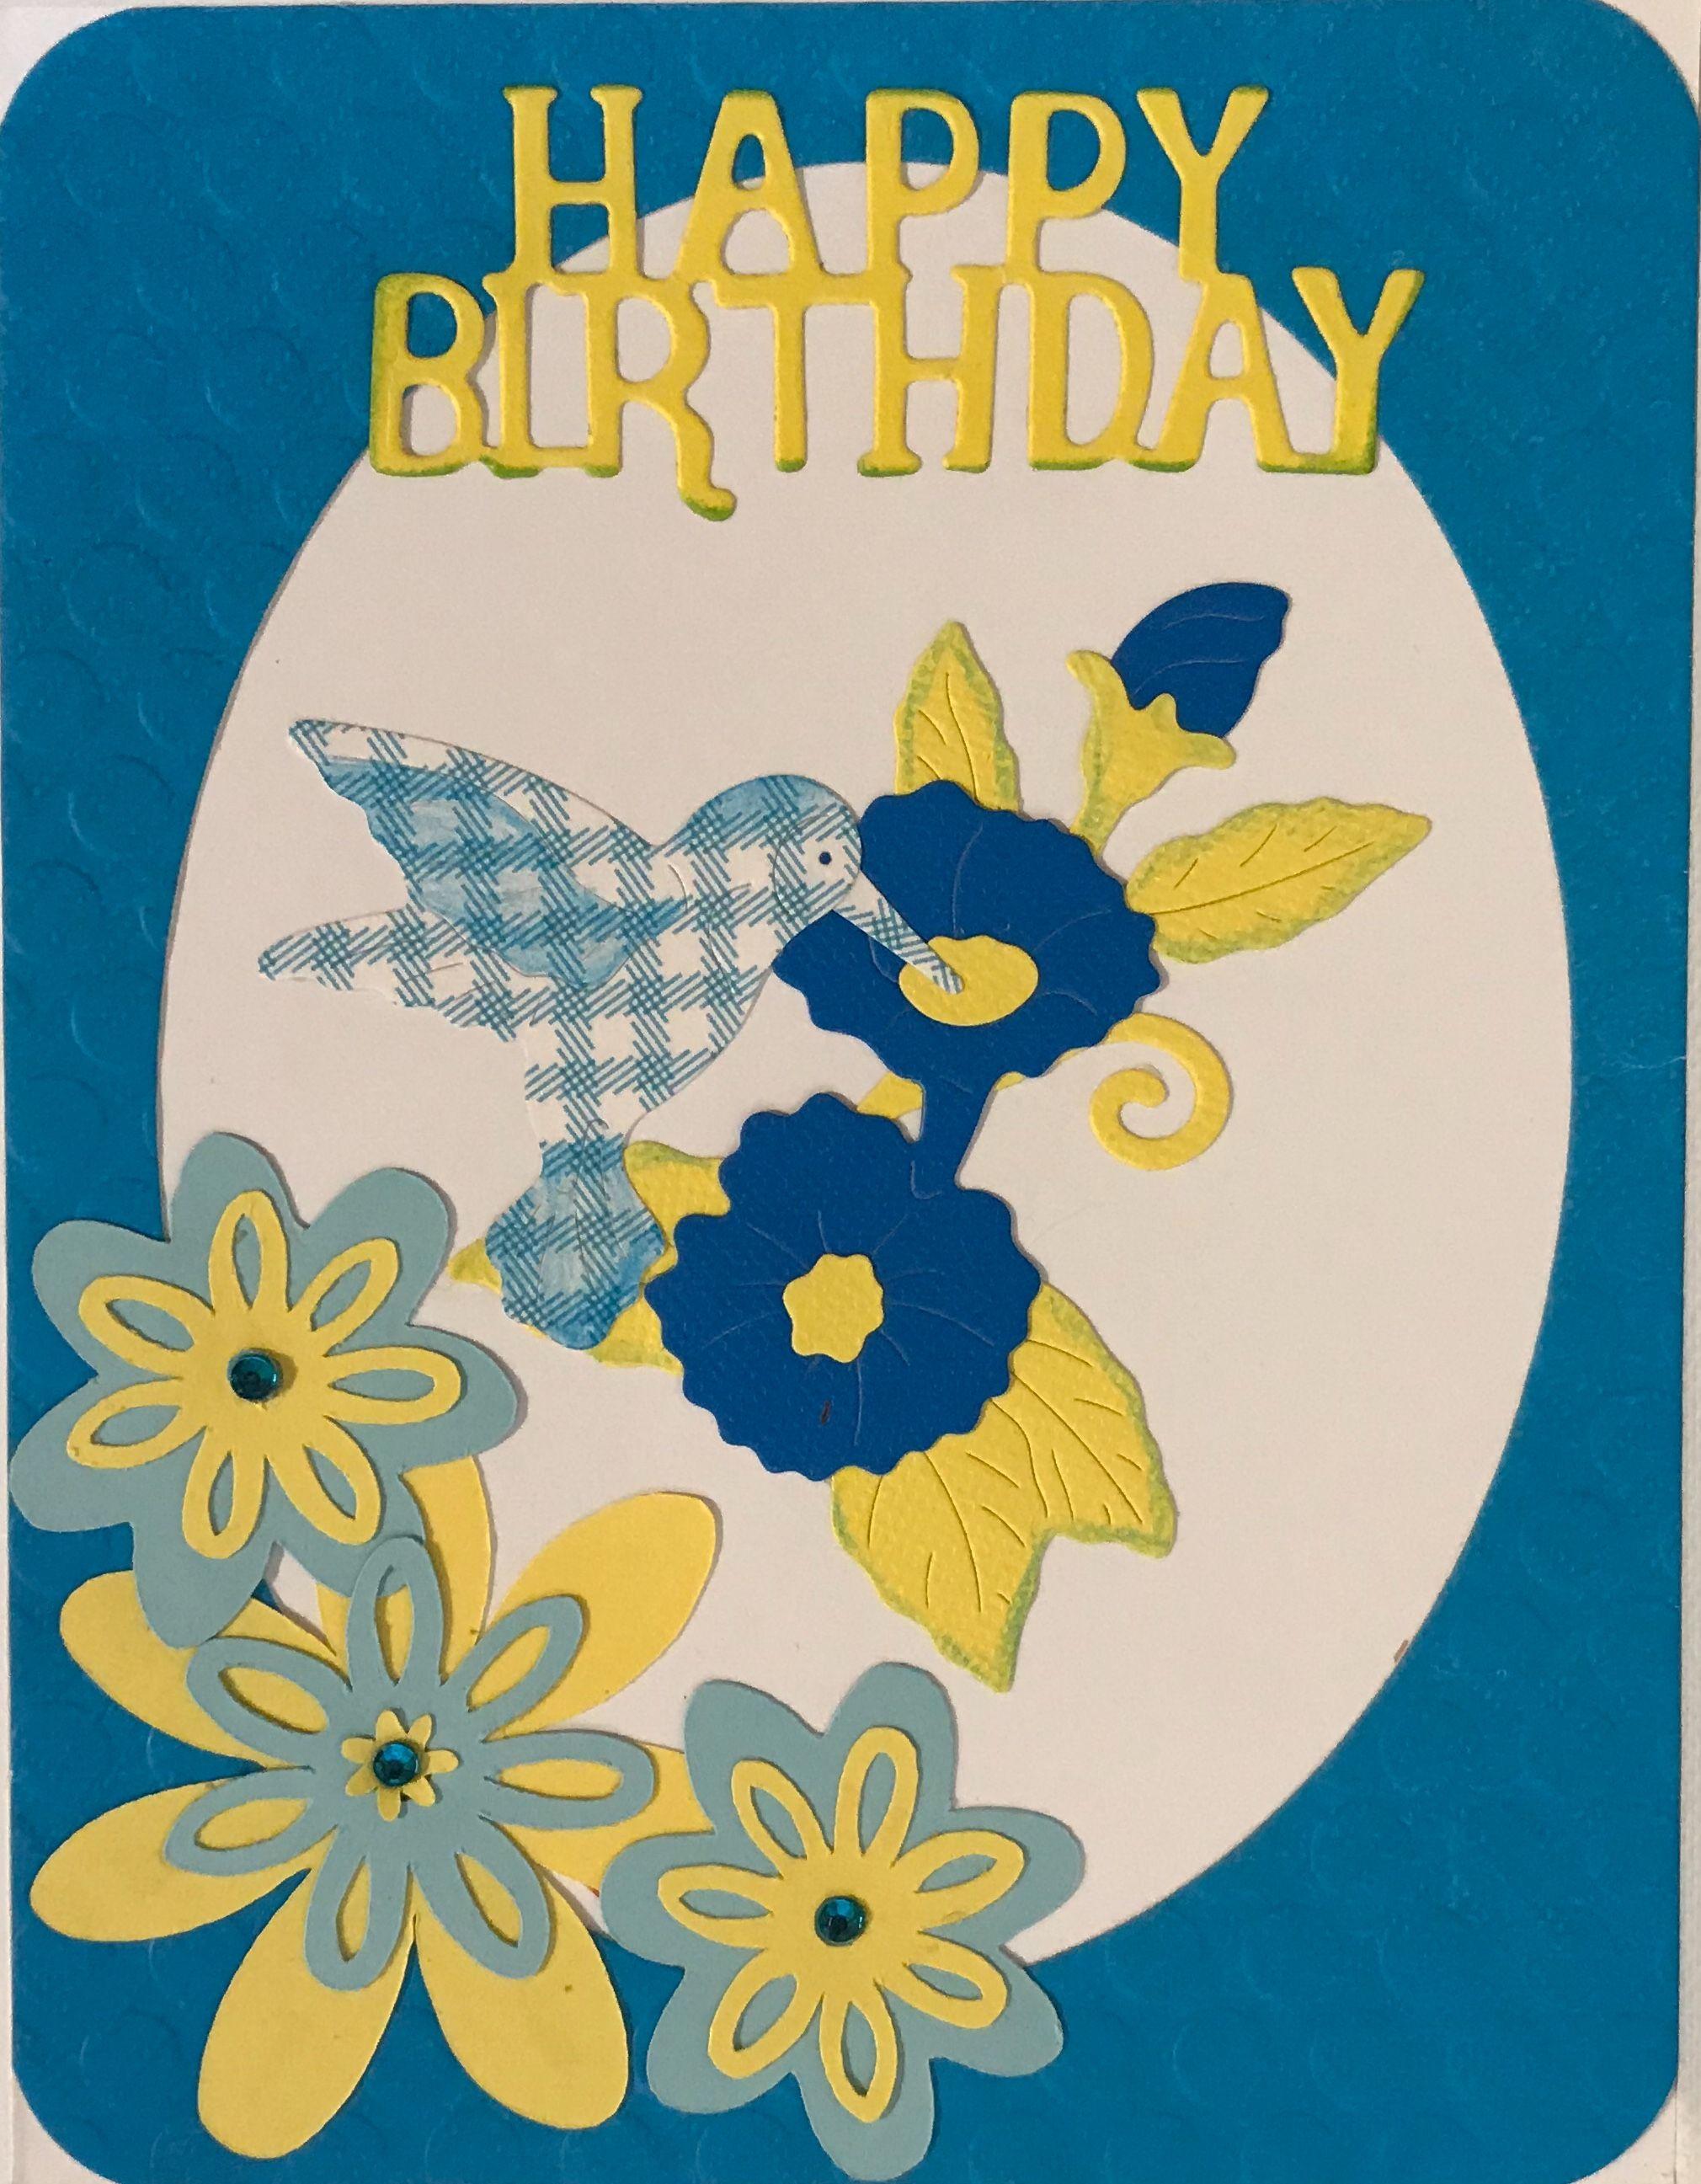 Birthday cardcottage cutz homemade cards handmade cardspaper